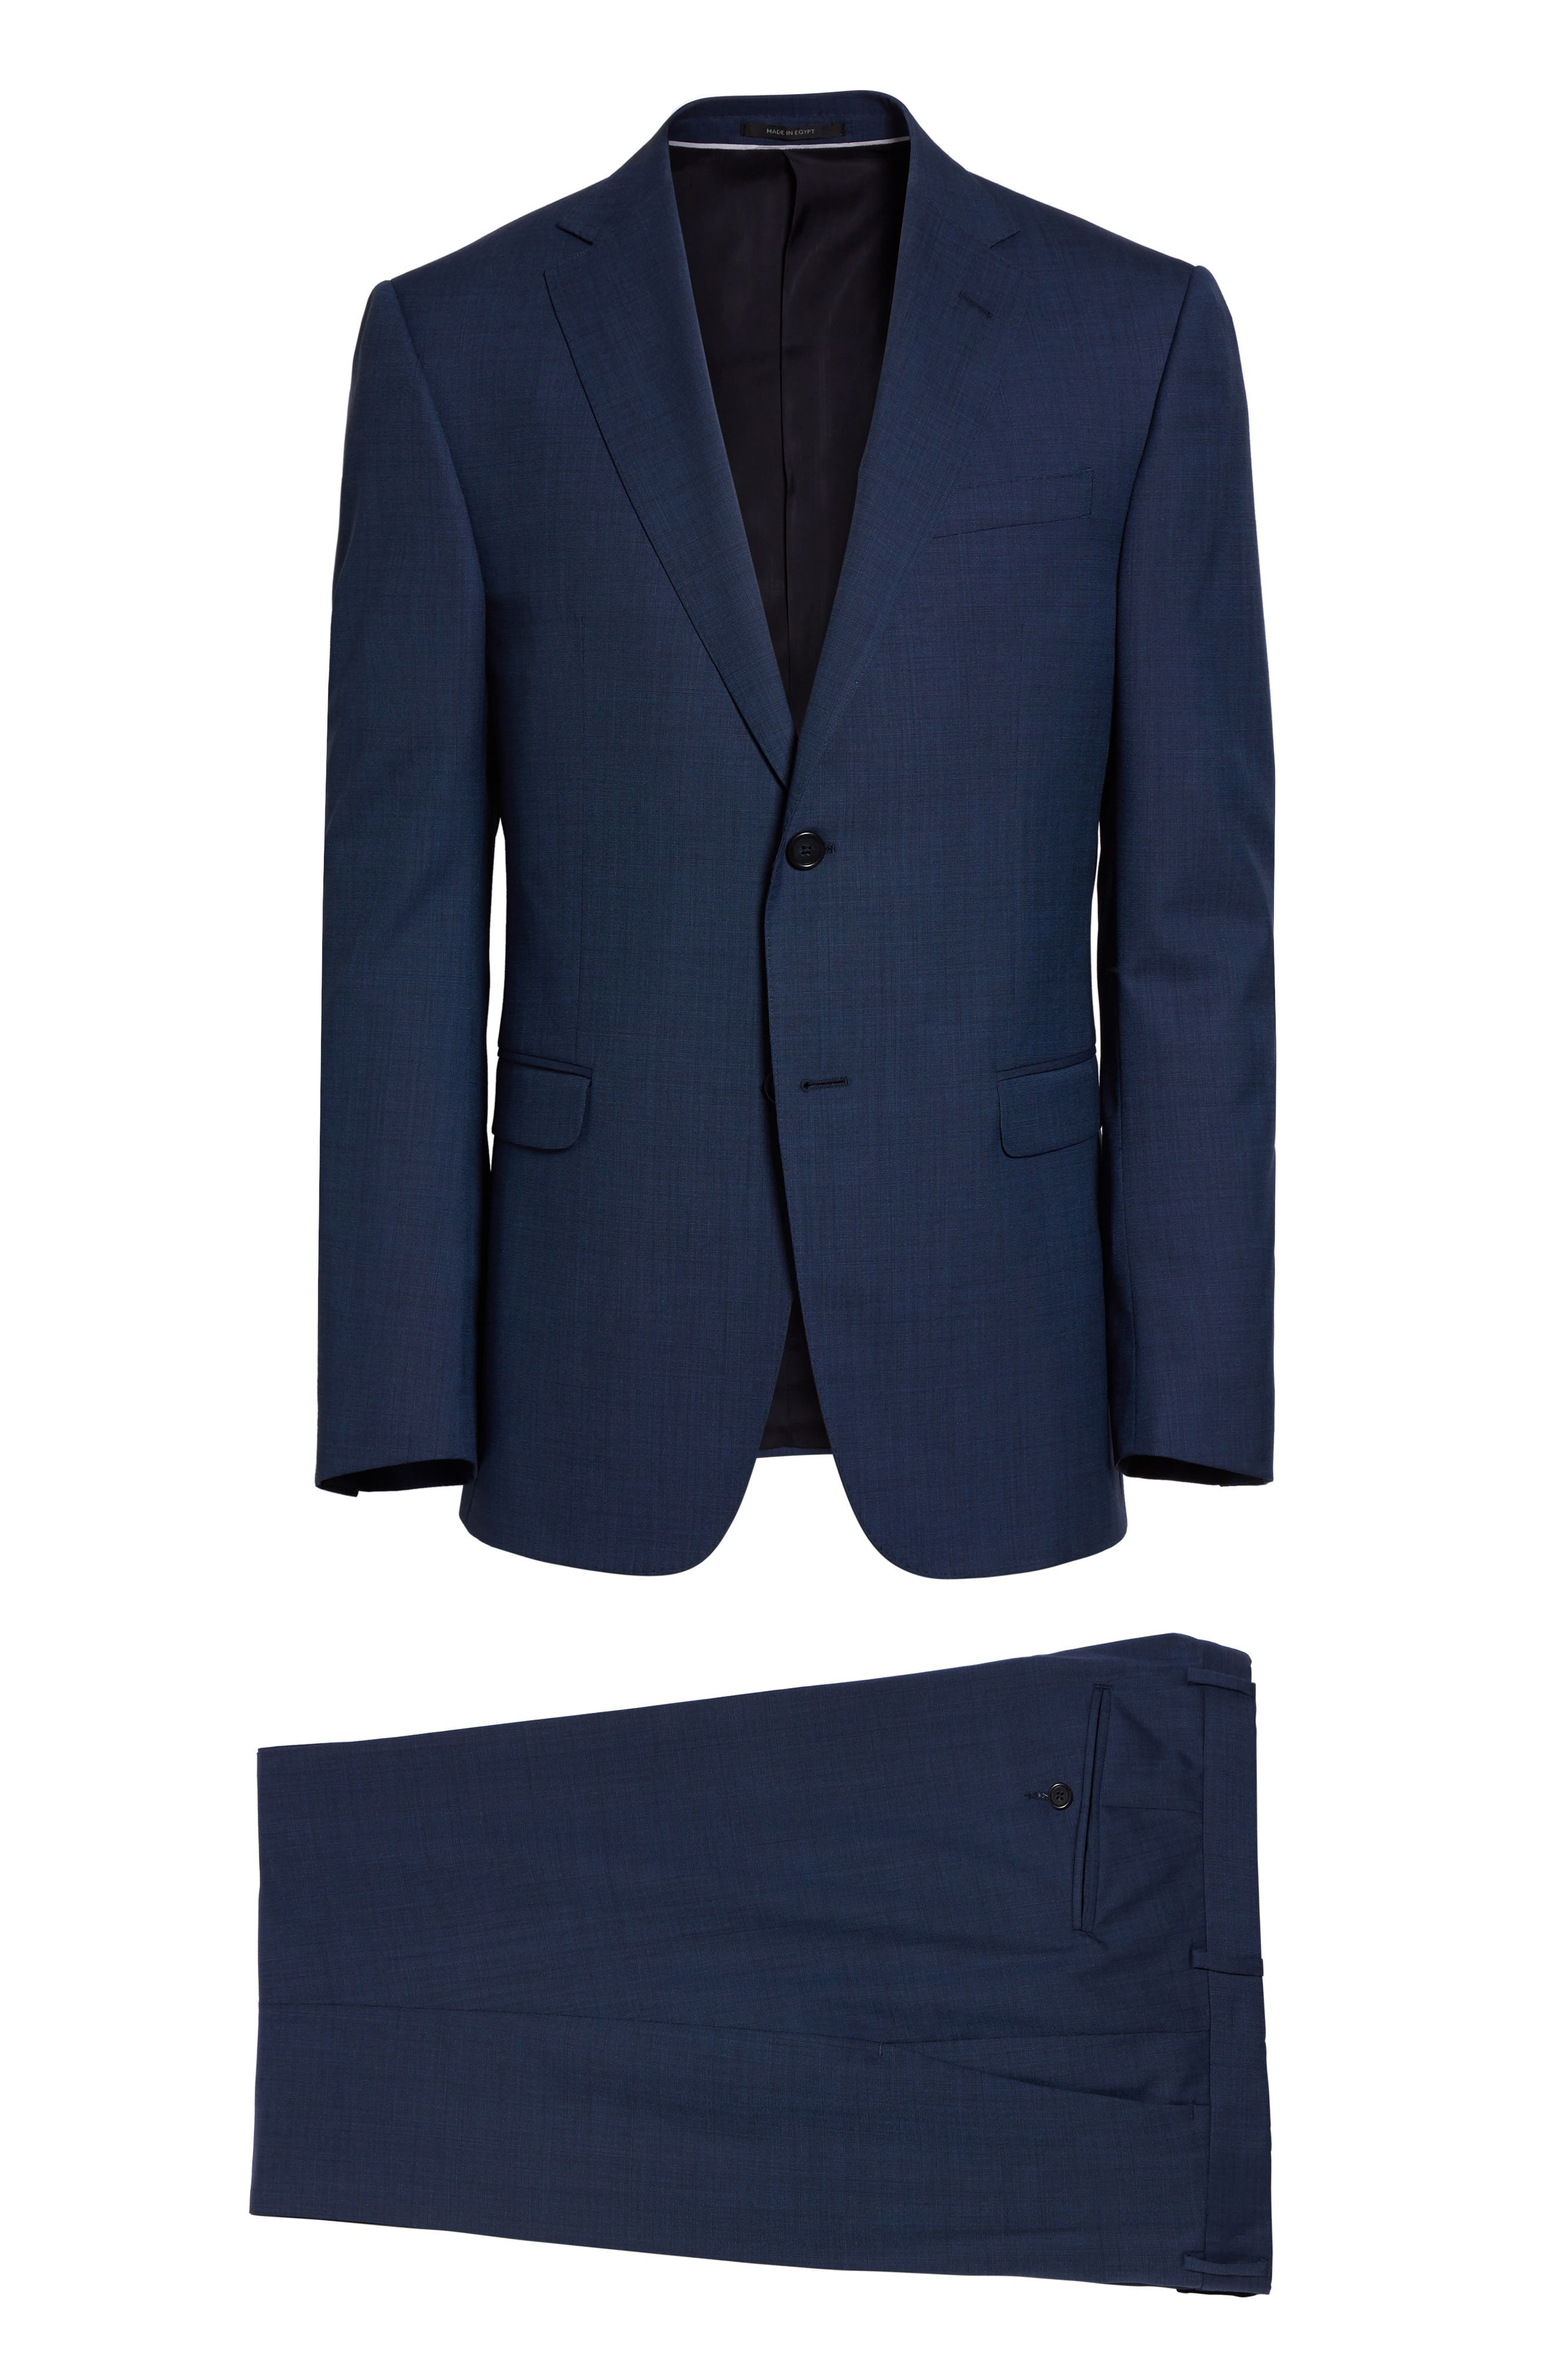 Drop 7 Trim Fit Solid Wool & Silk Suit,                             Alternate thumbnail 8, color,                             Navy